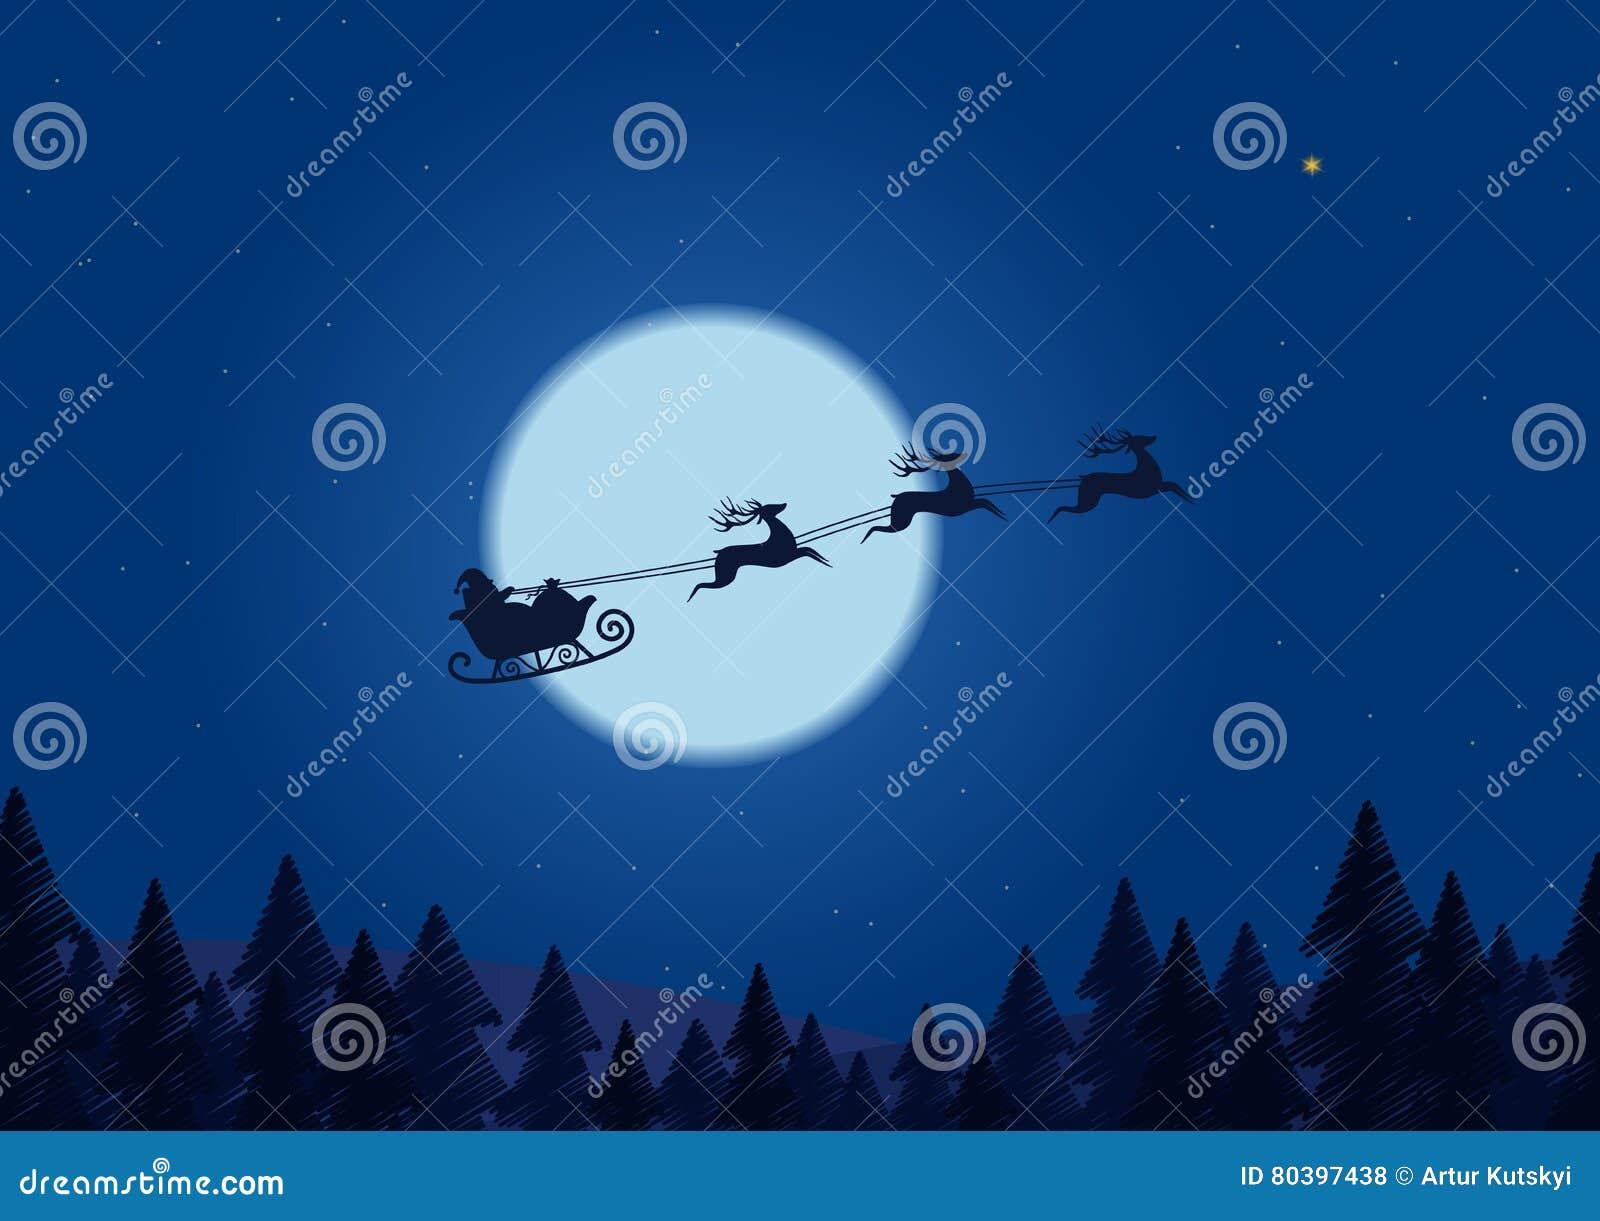 santa sleigh wallpaper free